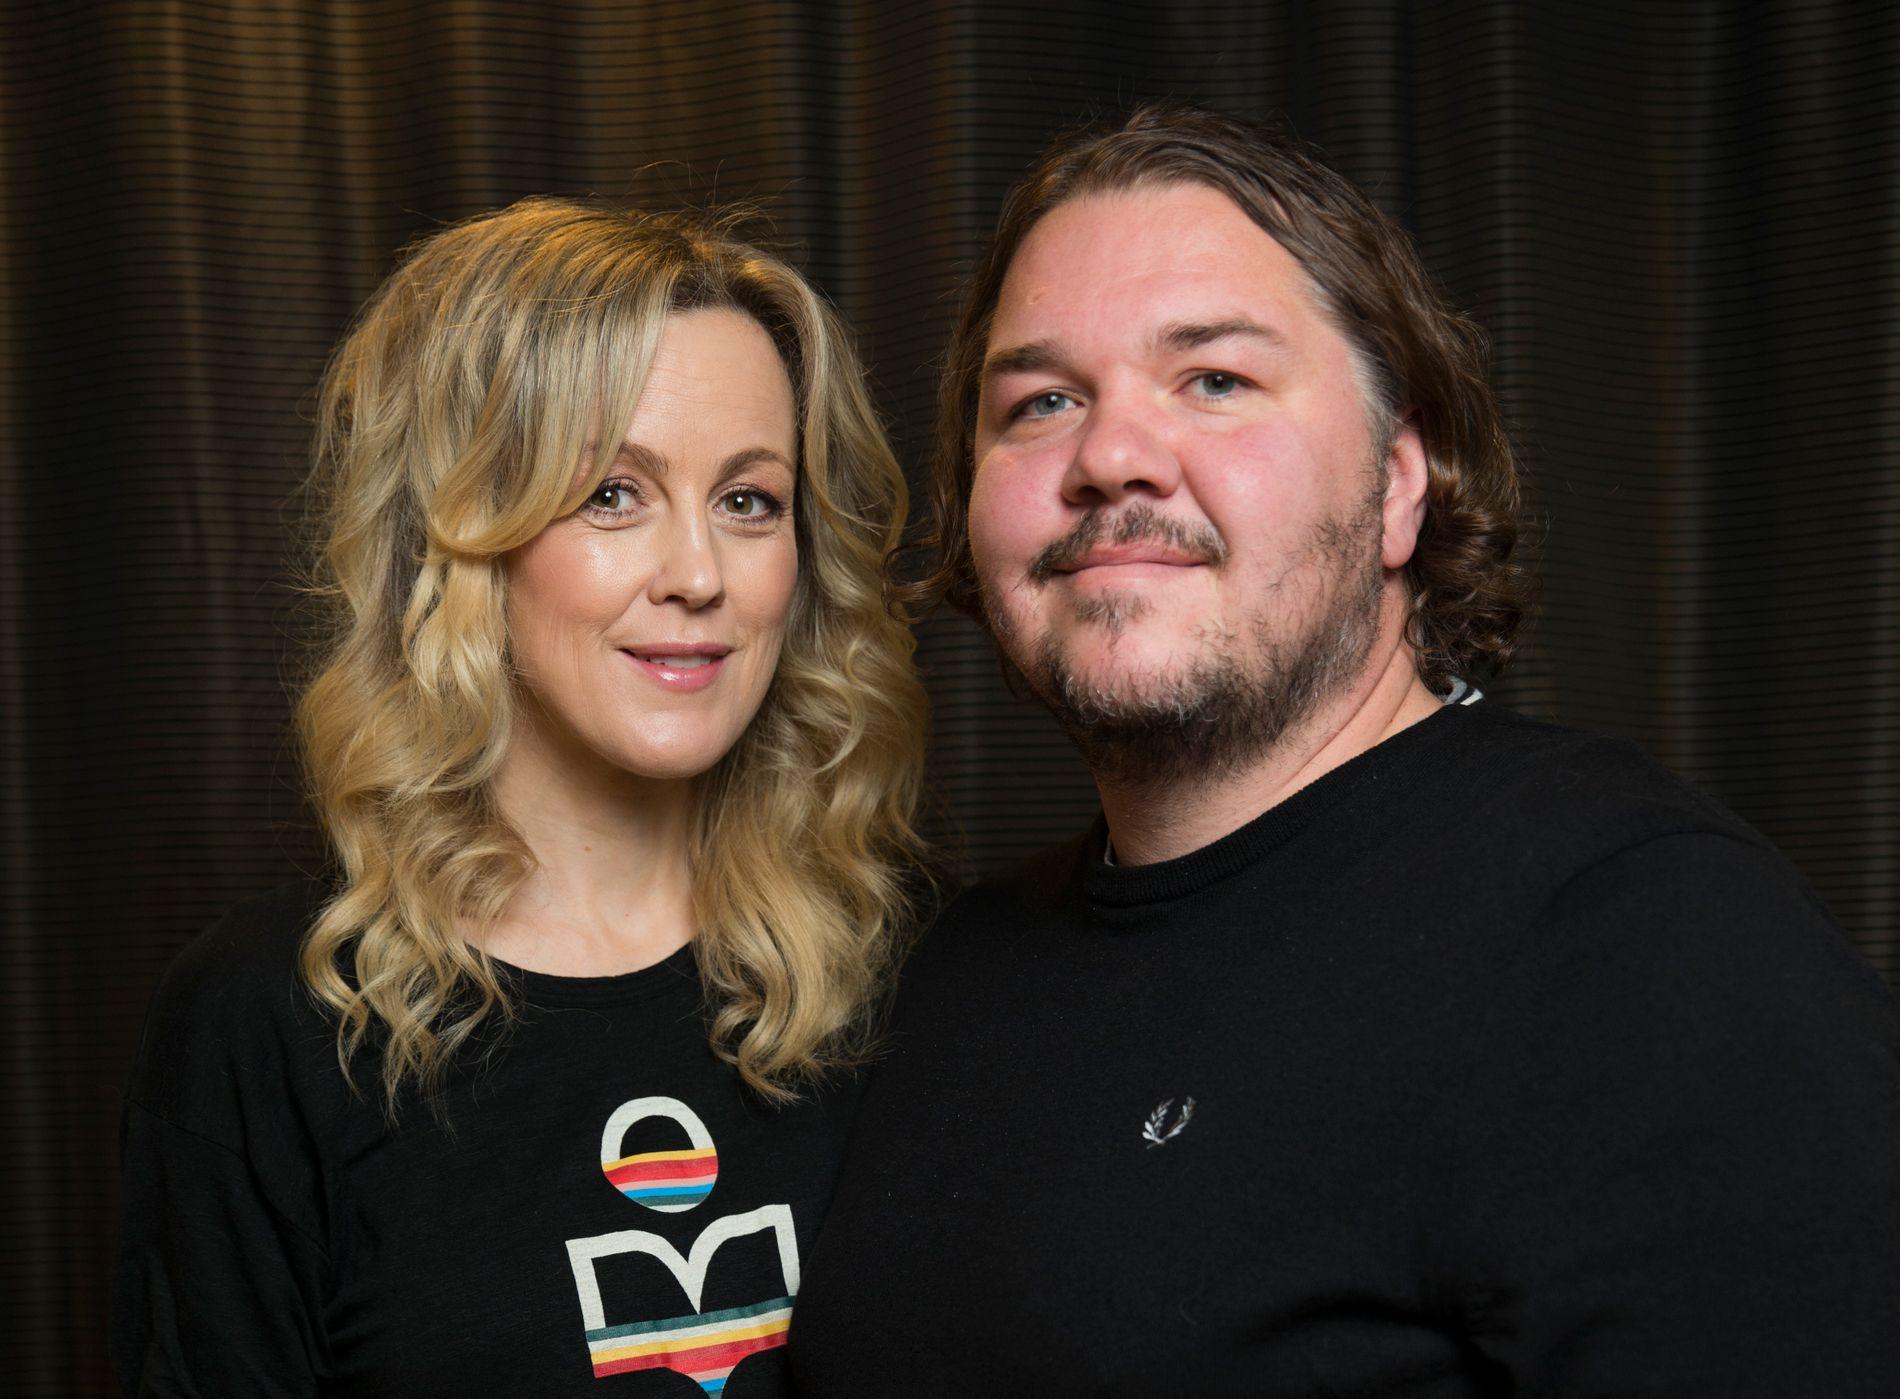 SAMMEN PÅ JOBB: Skuespillerne Marian Saastad Ottesen og Nils Jørgen Kaalstad under pressetreff for «Vikingane» fredag.